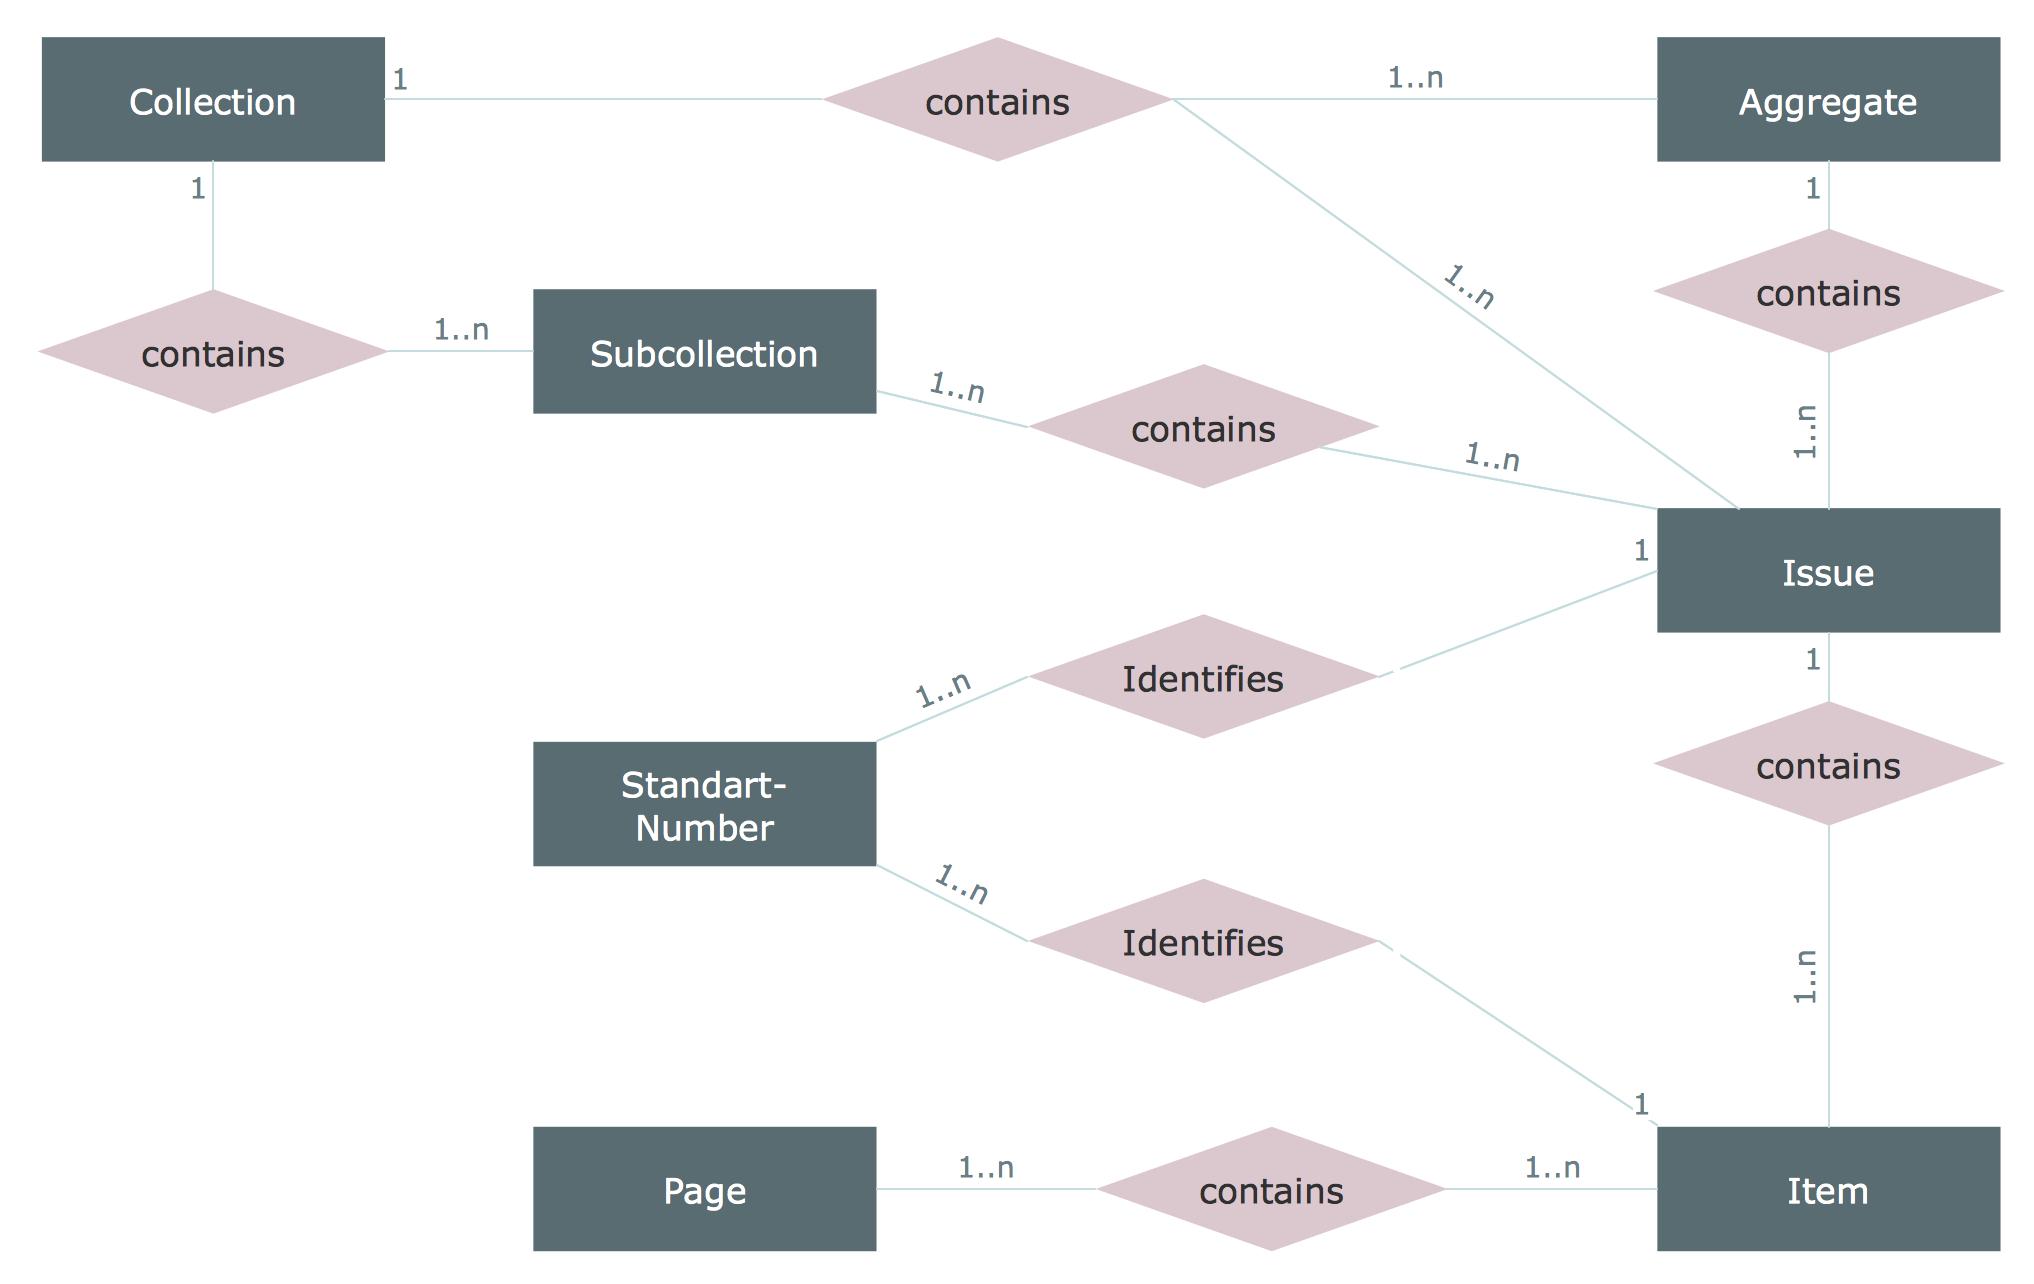 Entity Relationship Diagram (Erd) Solution   Conceptdraw with regard to Entity Relationship Diagram Database Example